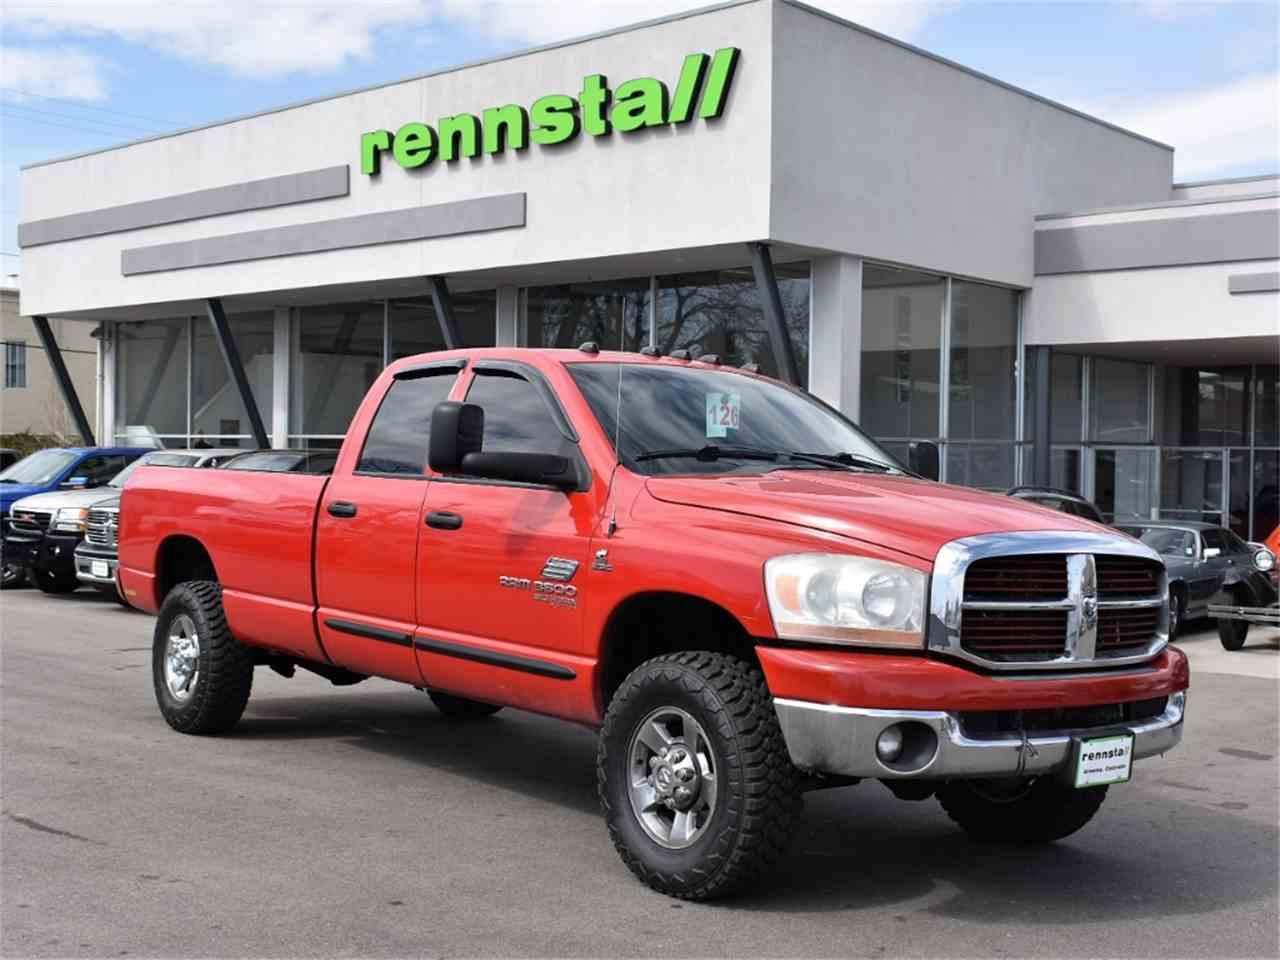 2006 Dodge Ram for Sale - CC-1021726